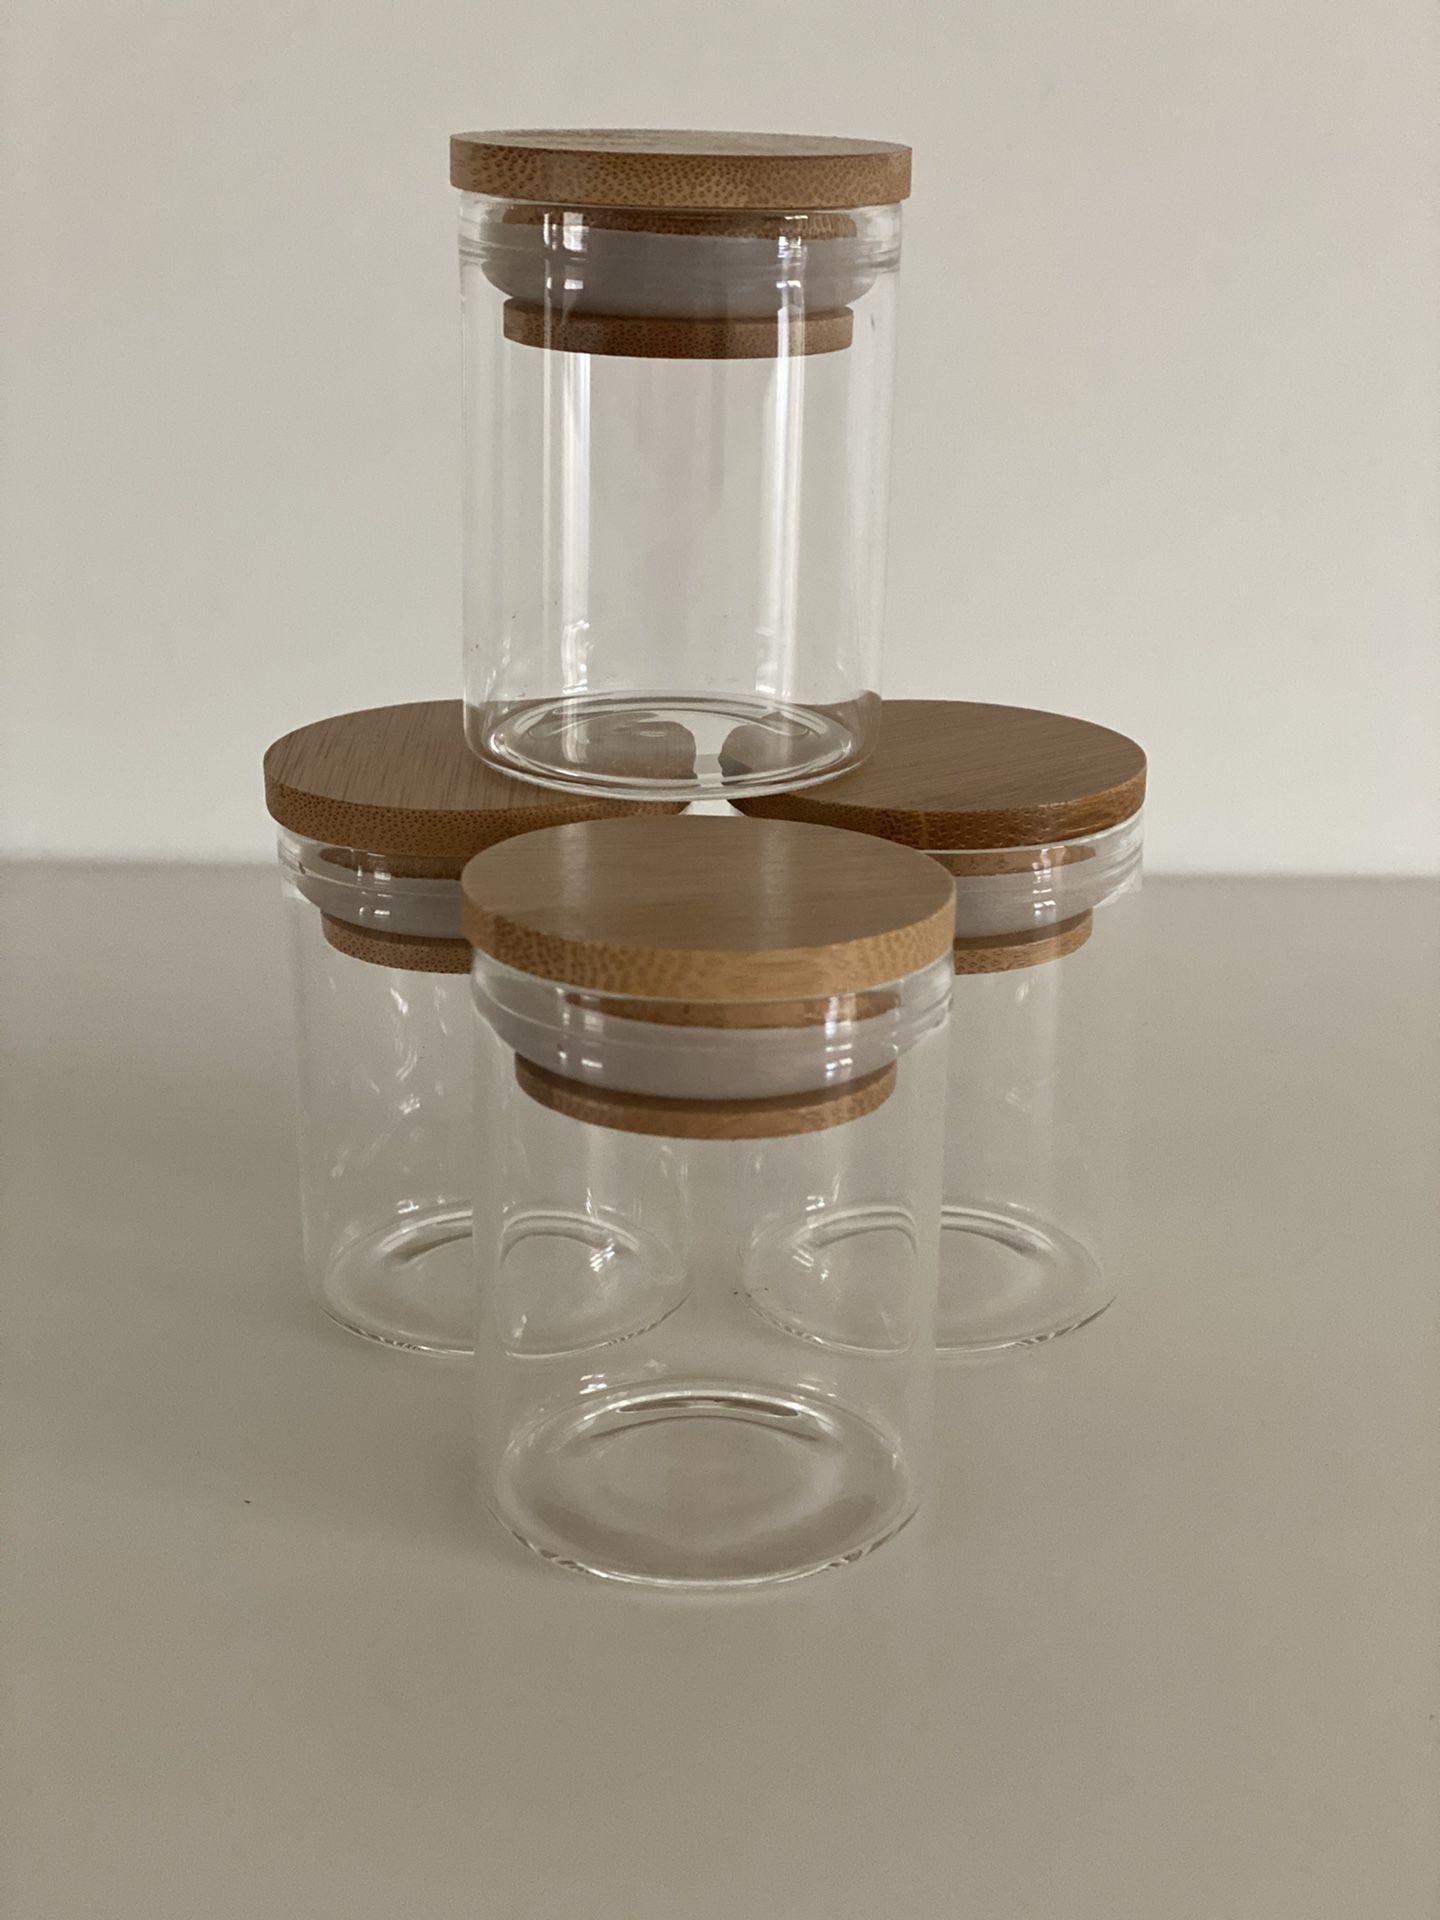 26 x 2 oz borosilicate glass spice jar with bamboo lid